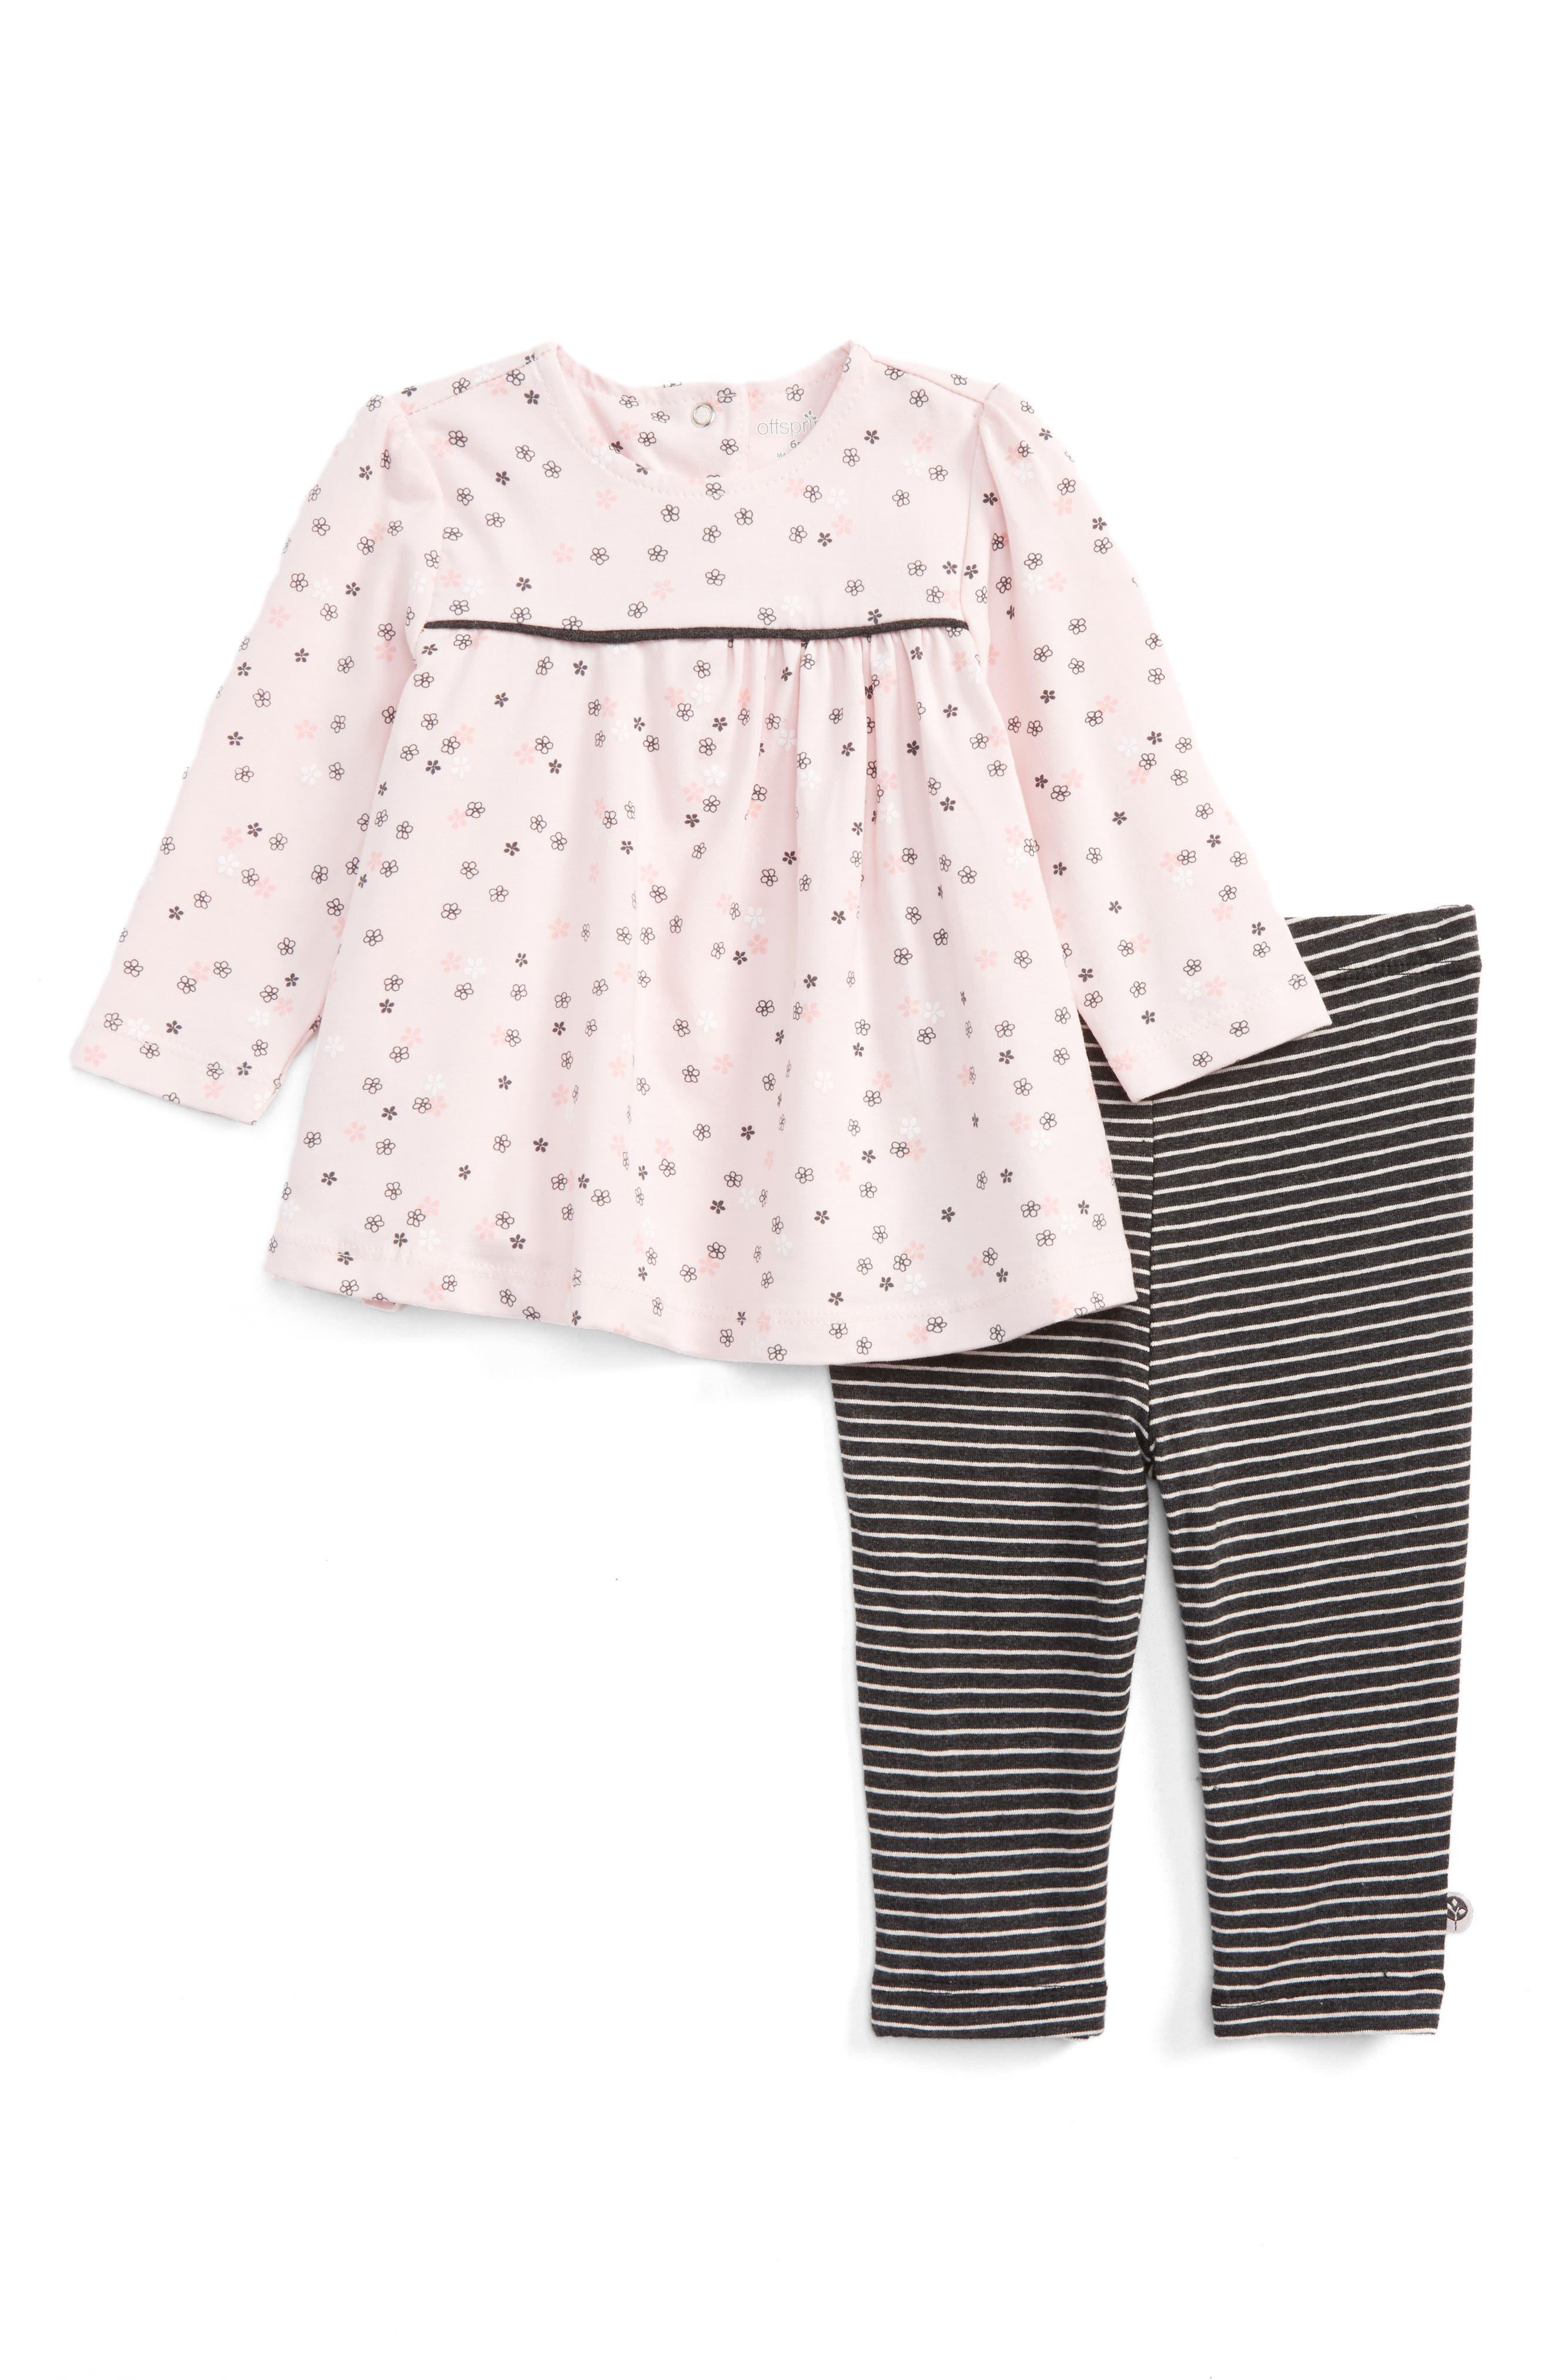 Delicate Blush Tunic & Leggings Set,                         Main,                         color, Pink Multi